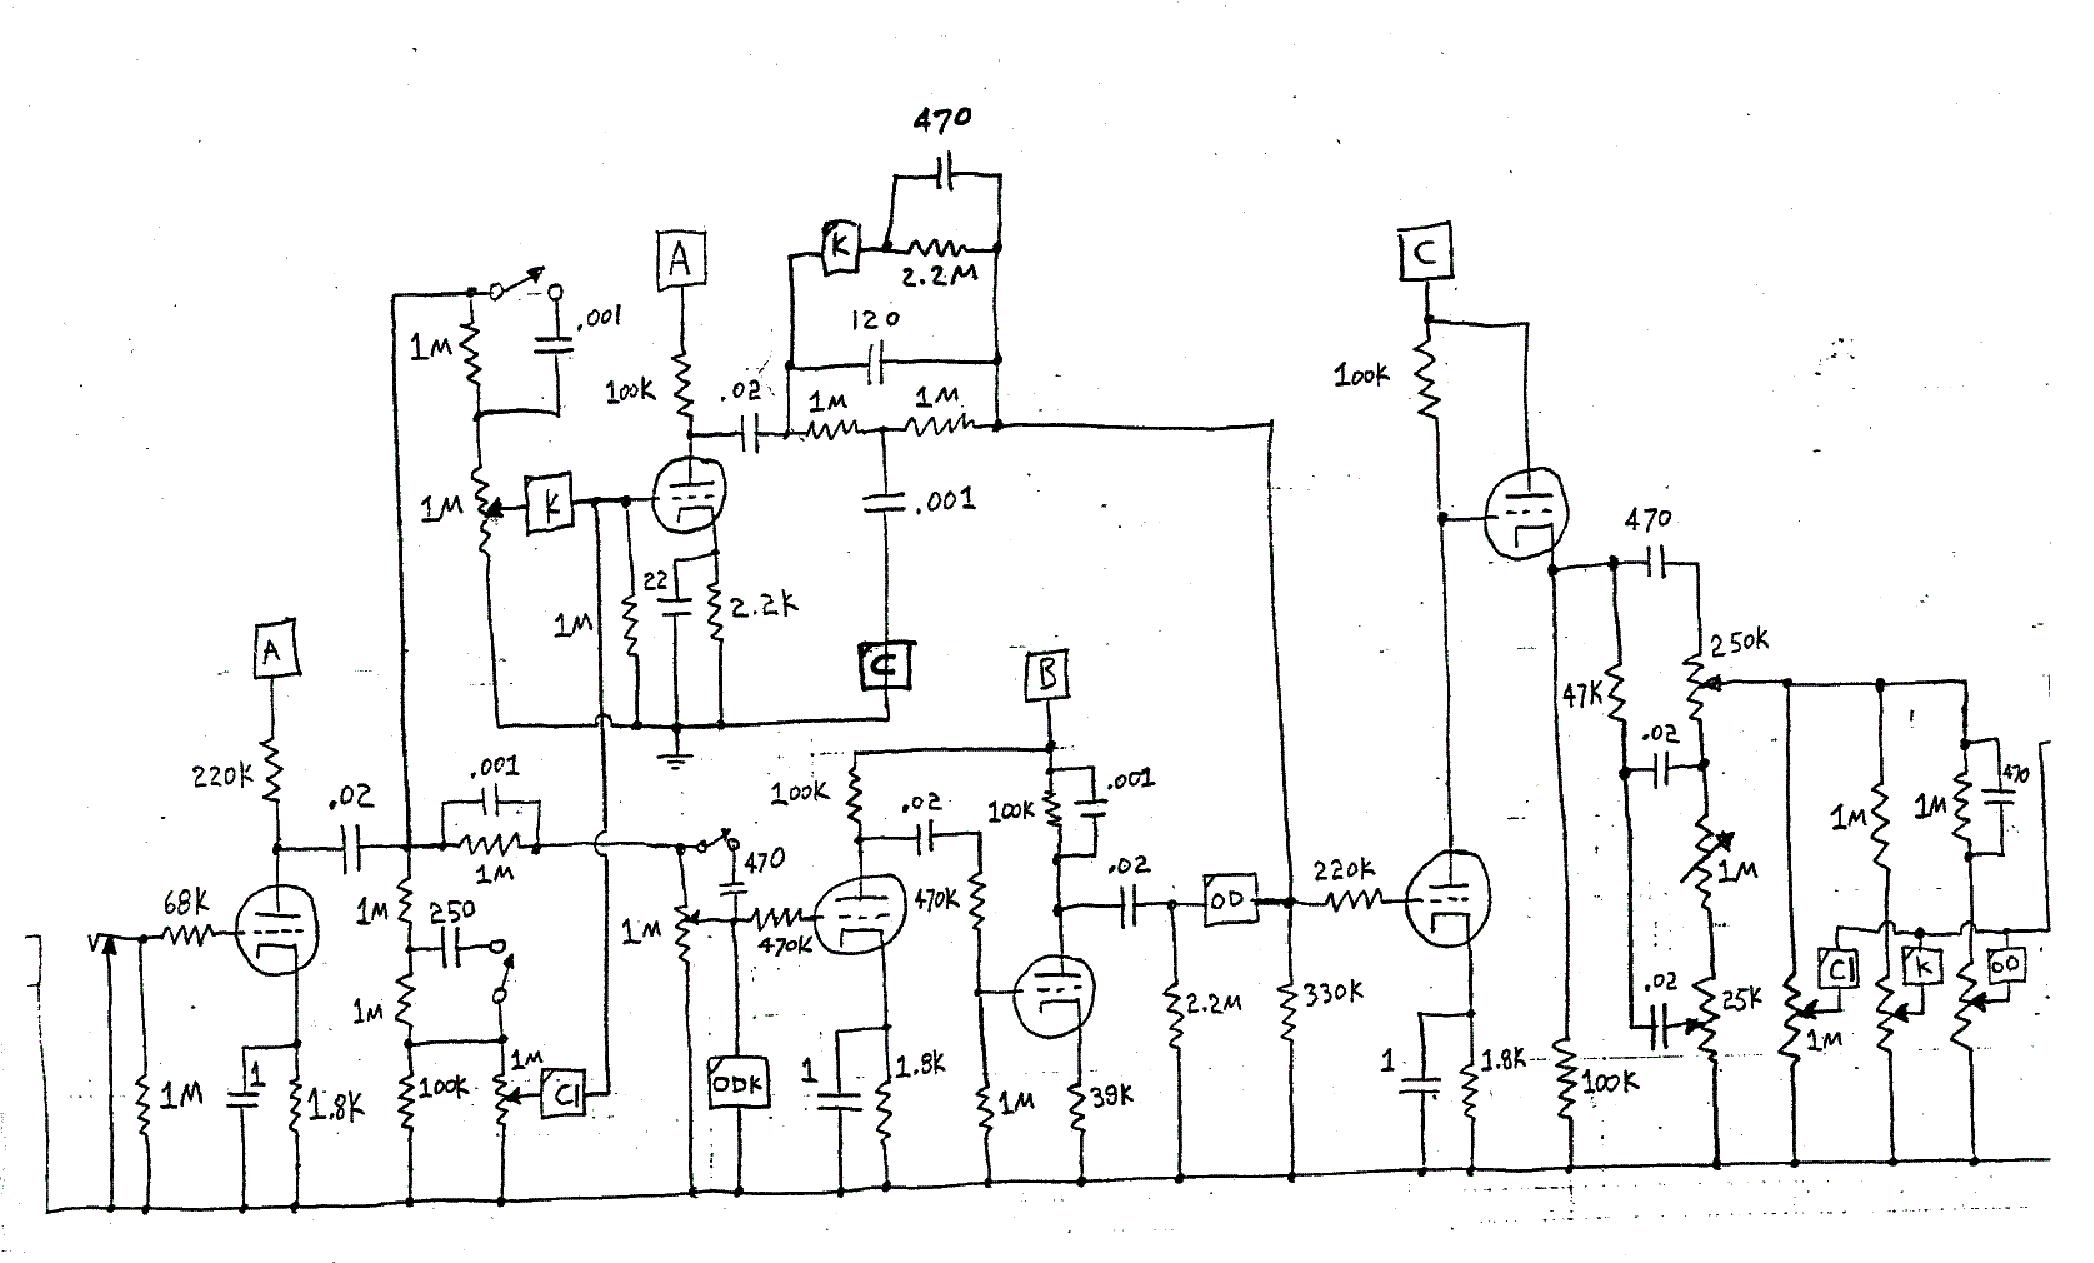 Soldano slo 100 schematic pdf